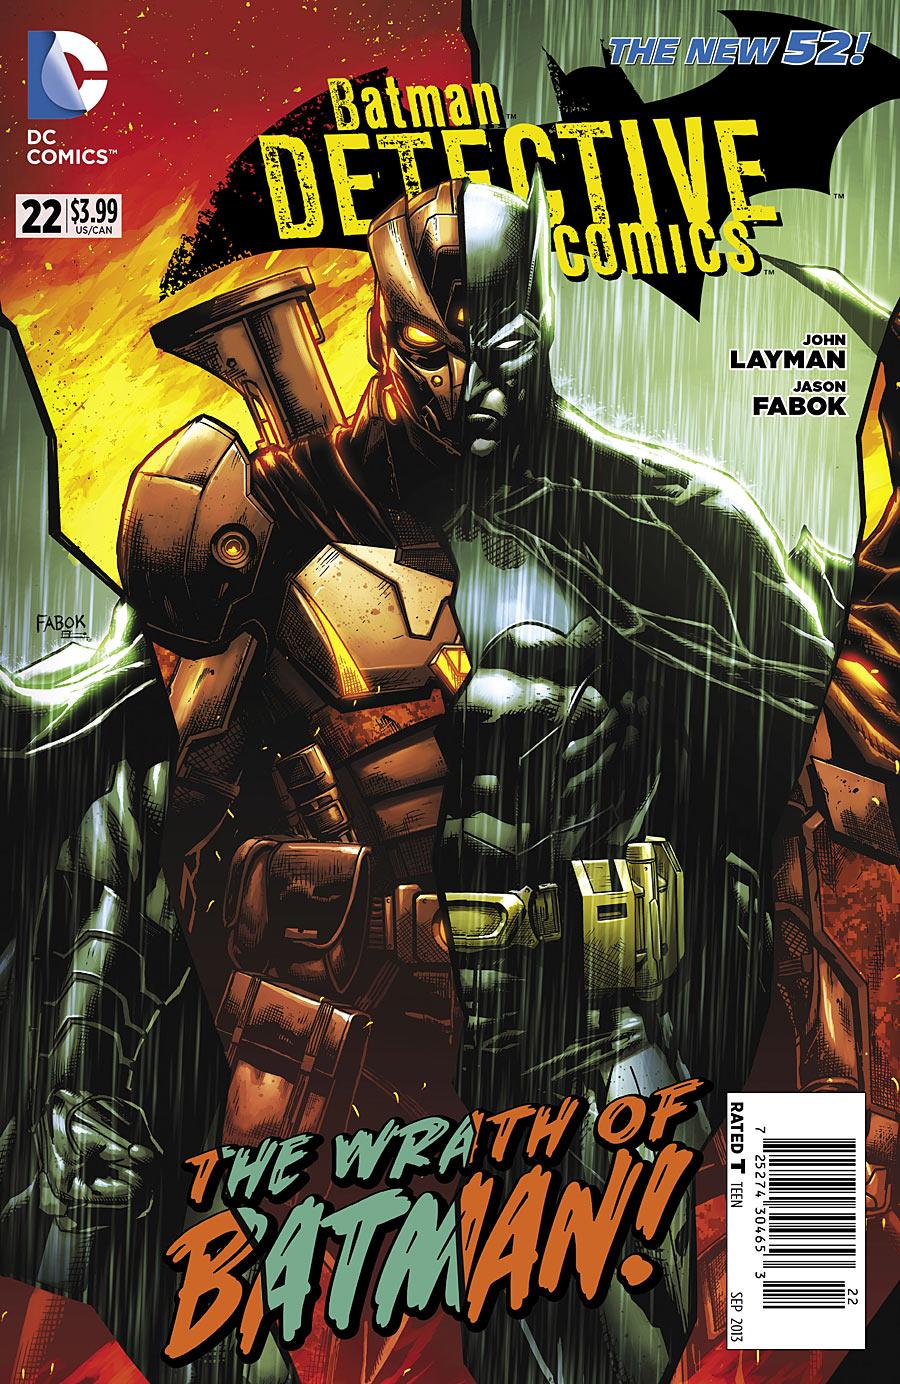 Detective Comics New 52 1-17 - The Pirate Bay